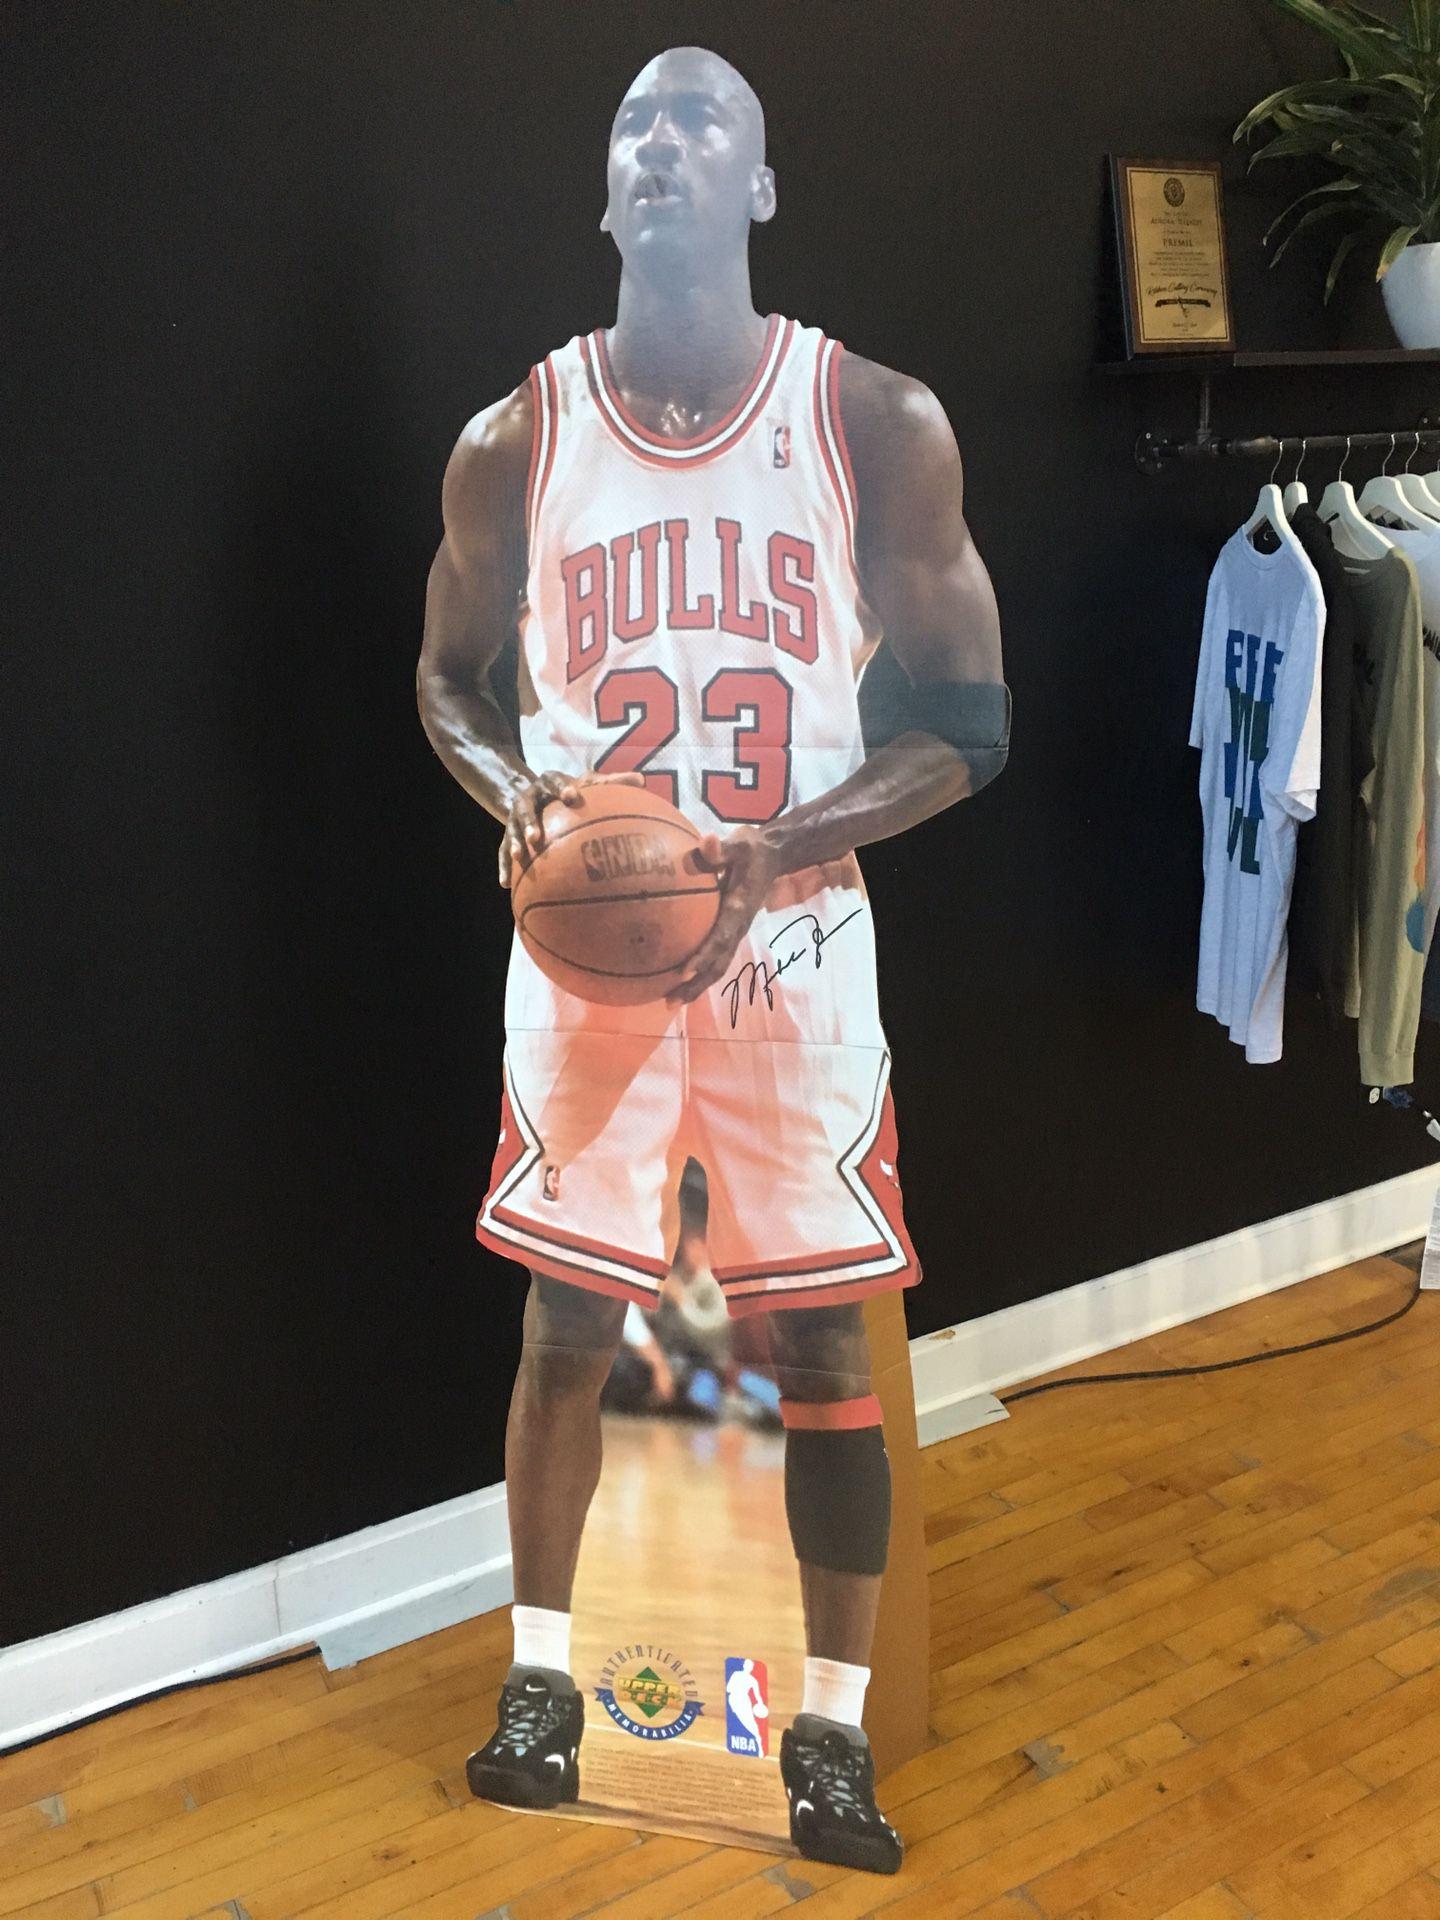 1996 Upper Deck MJ cutout